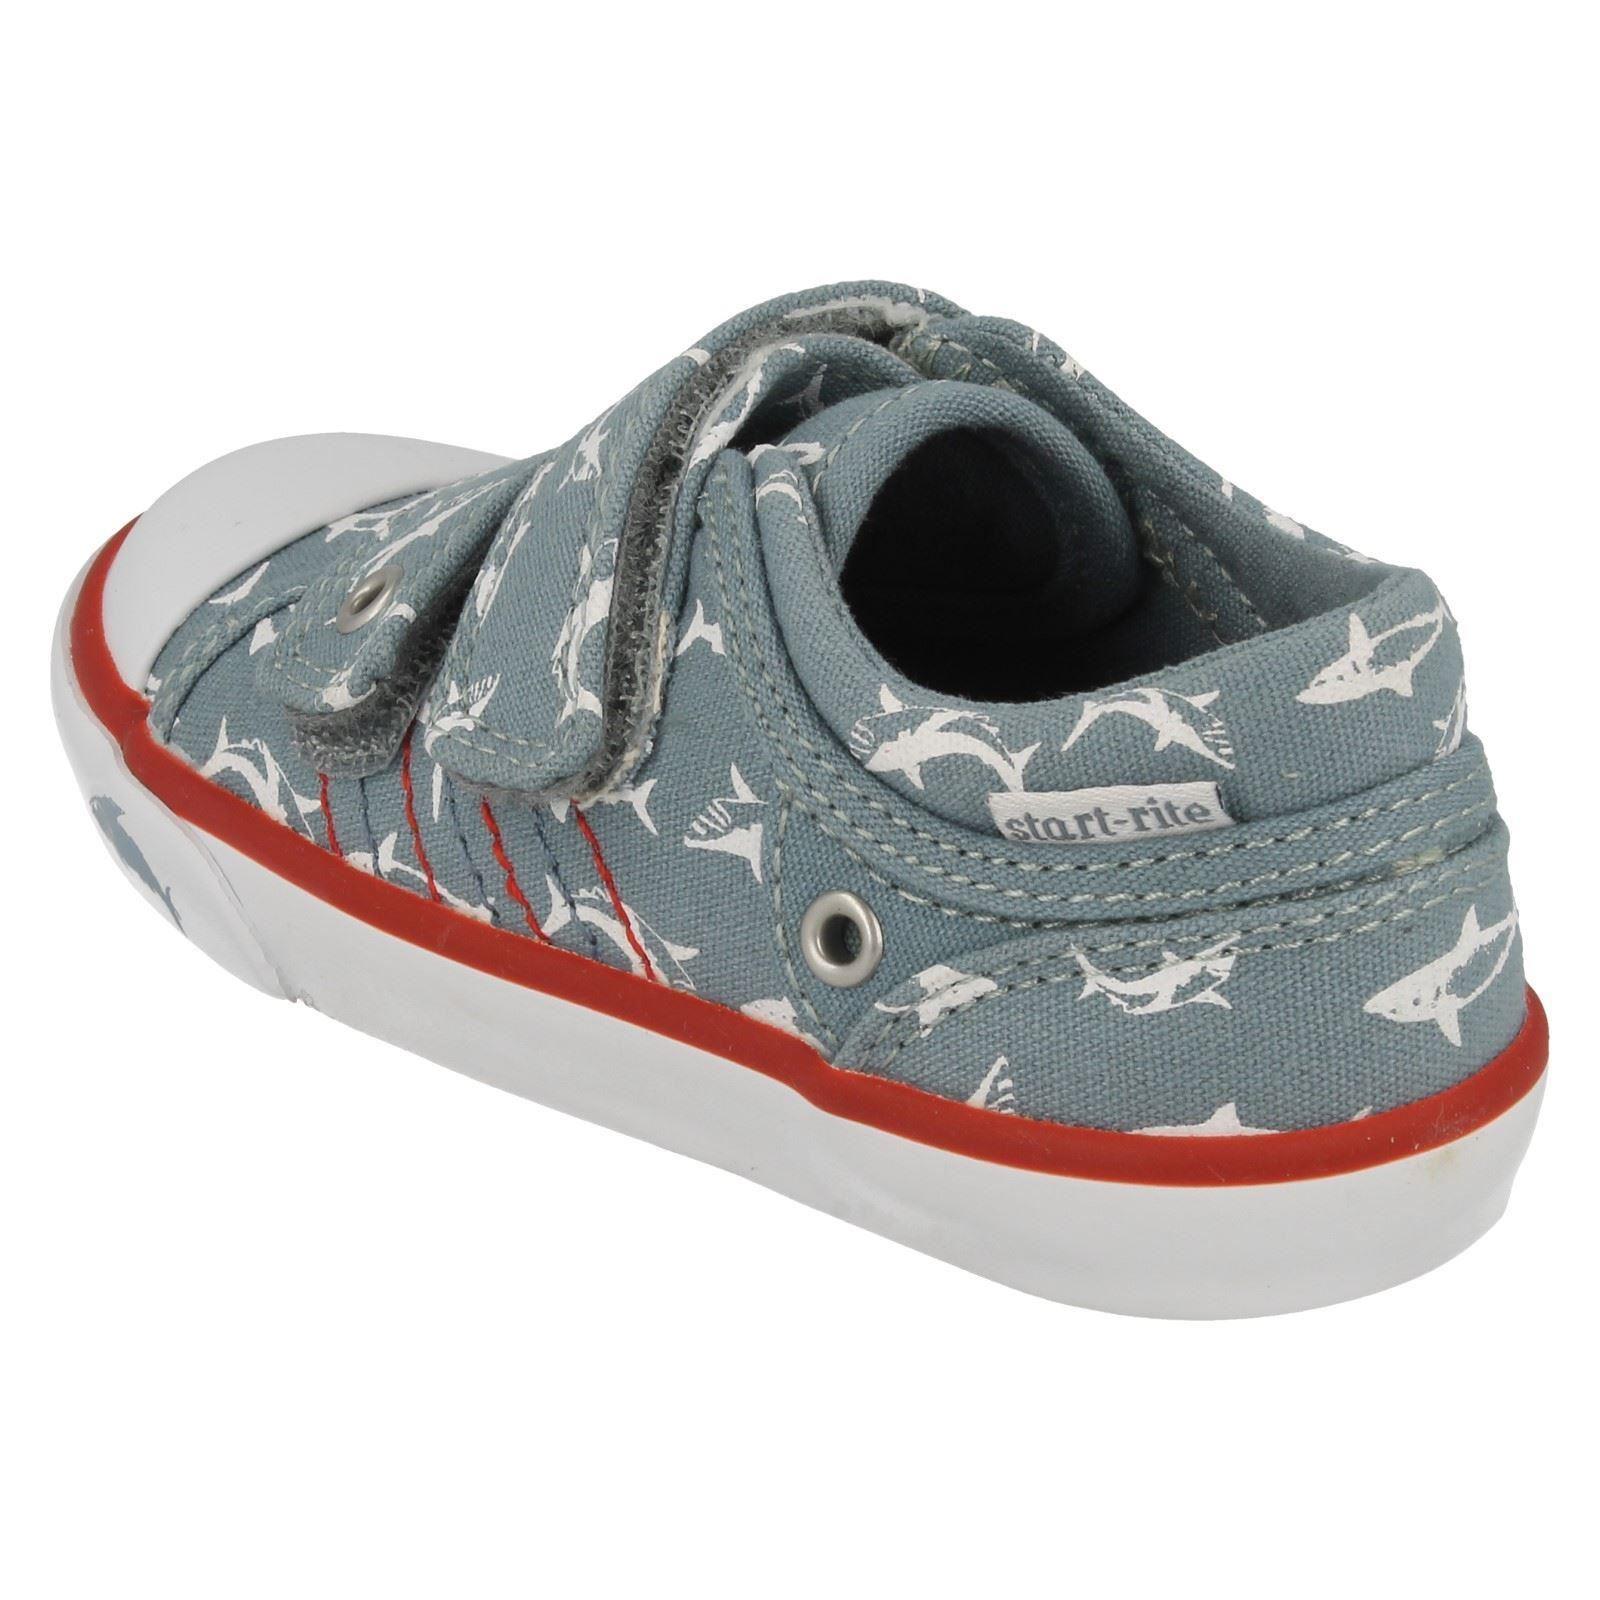 Boys Startrite Canvas Shoes /'Sea Spray/'